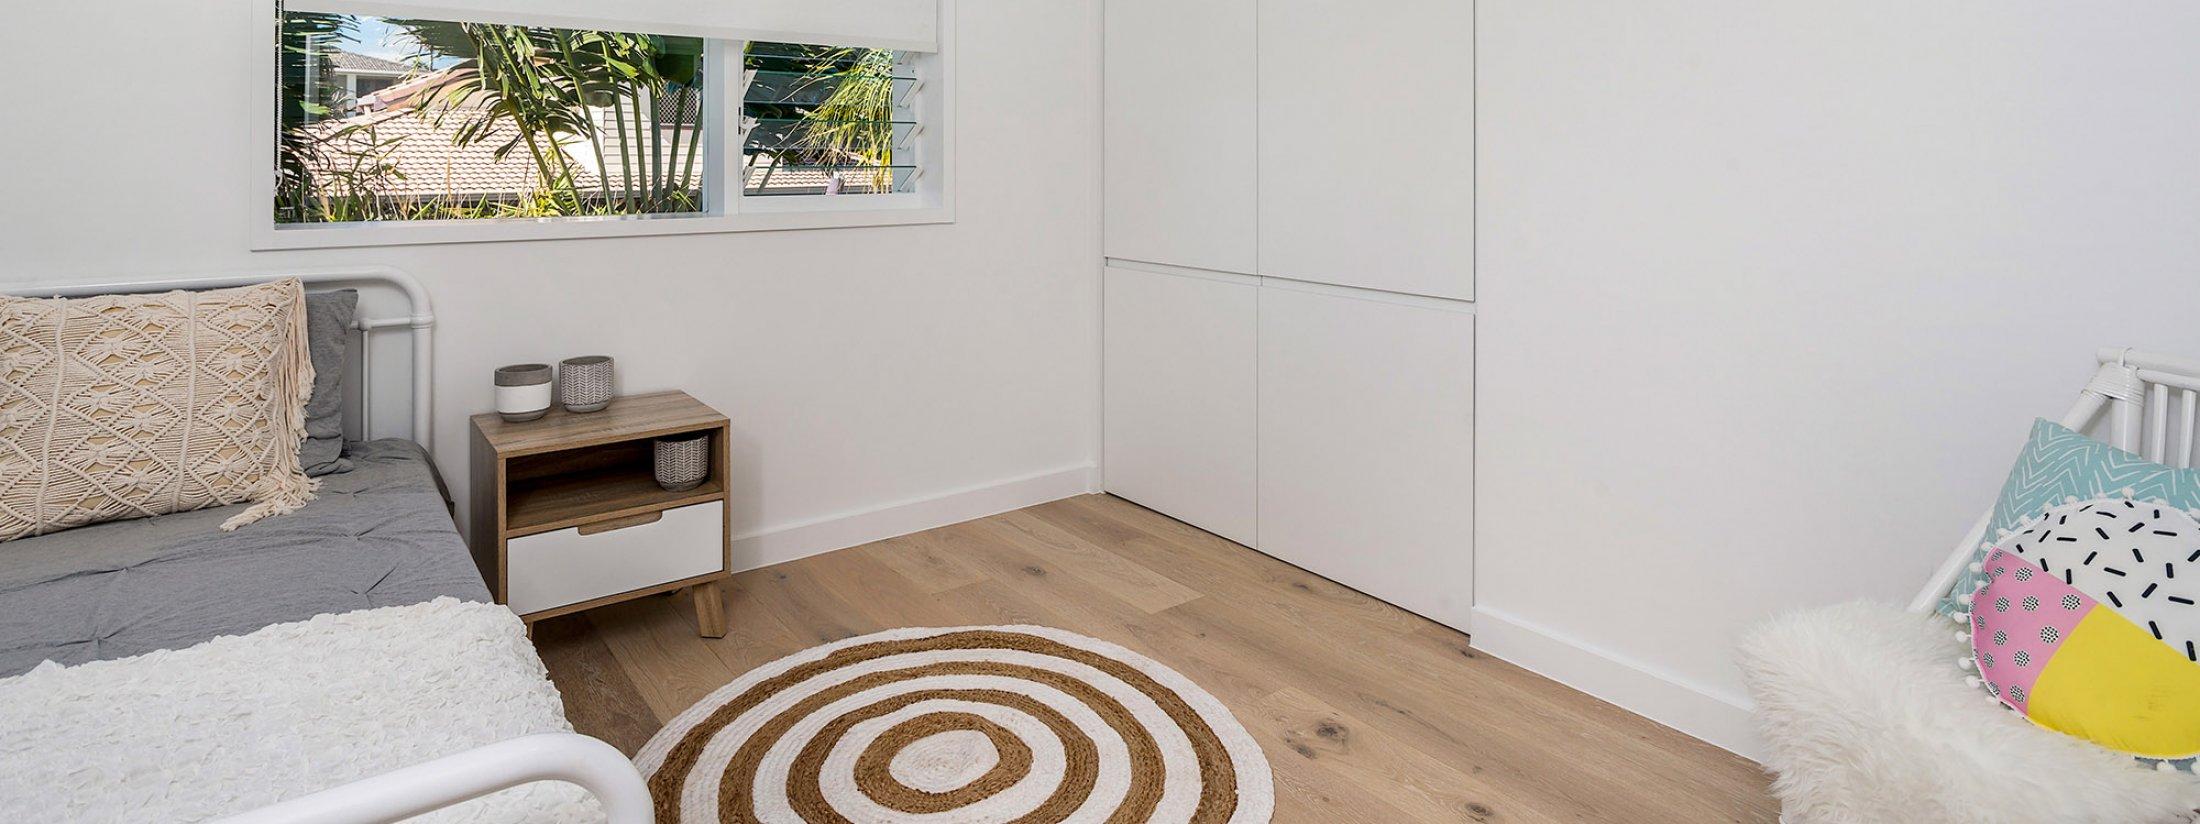 Castaway on Tallows - Byron Bay - Bedroom 1 Upstairs